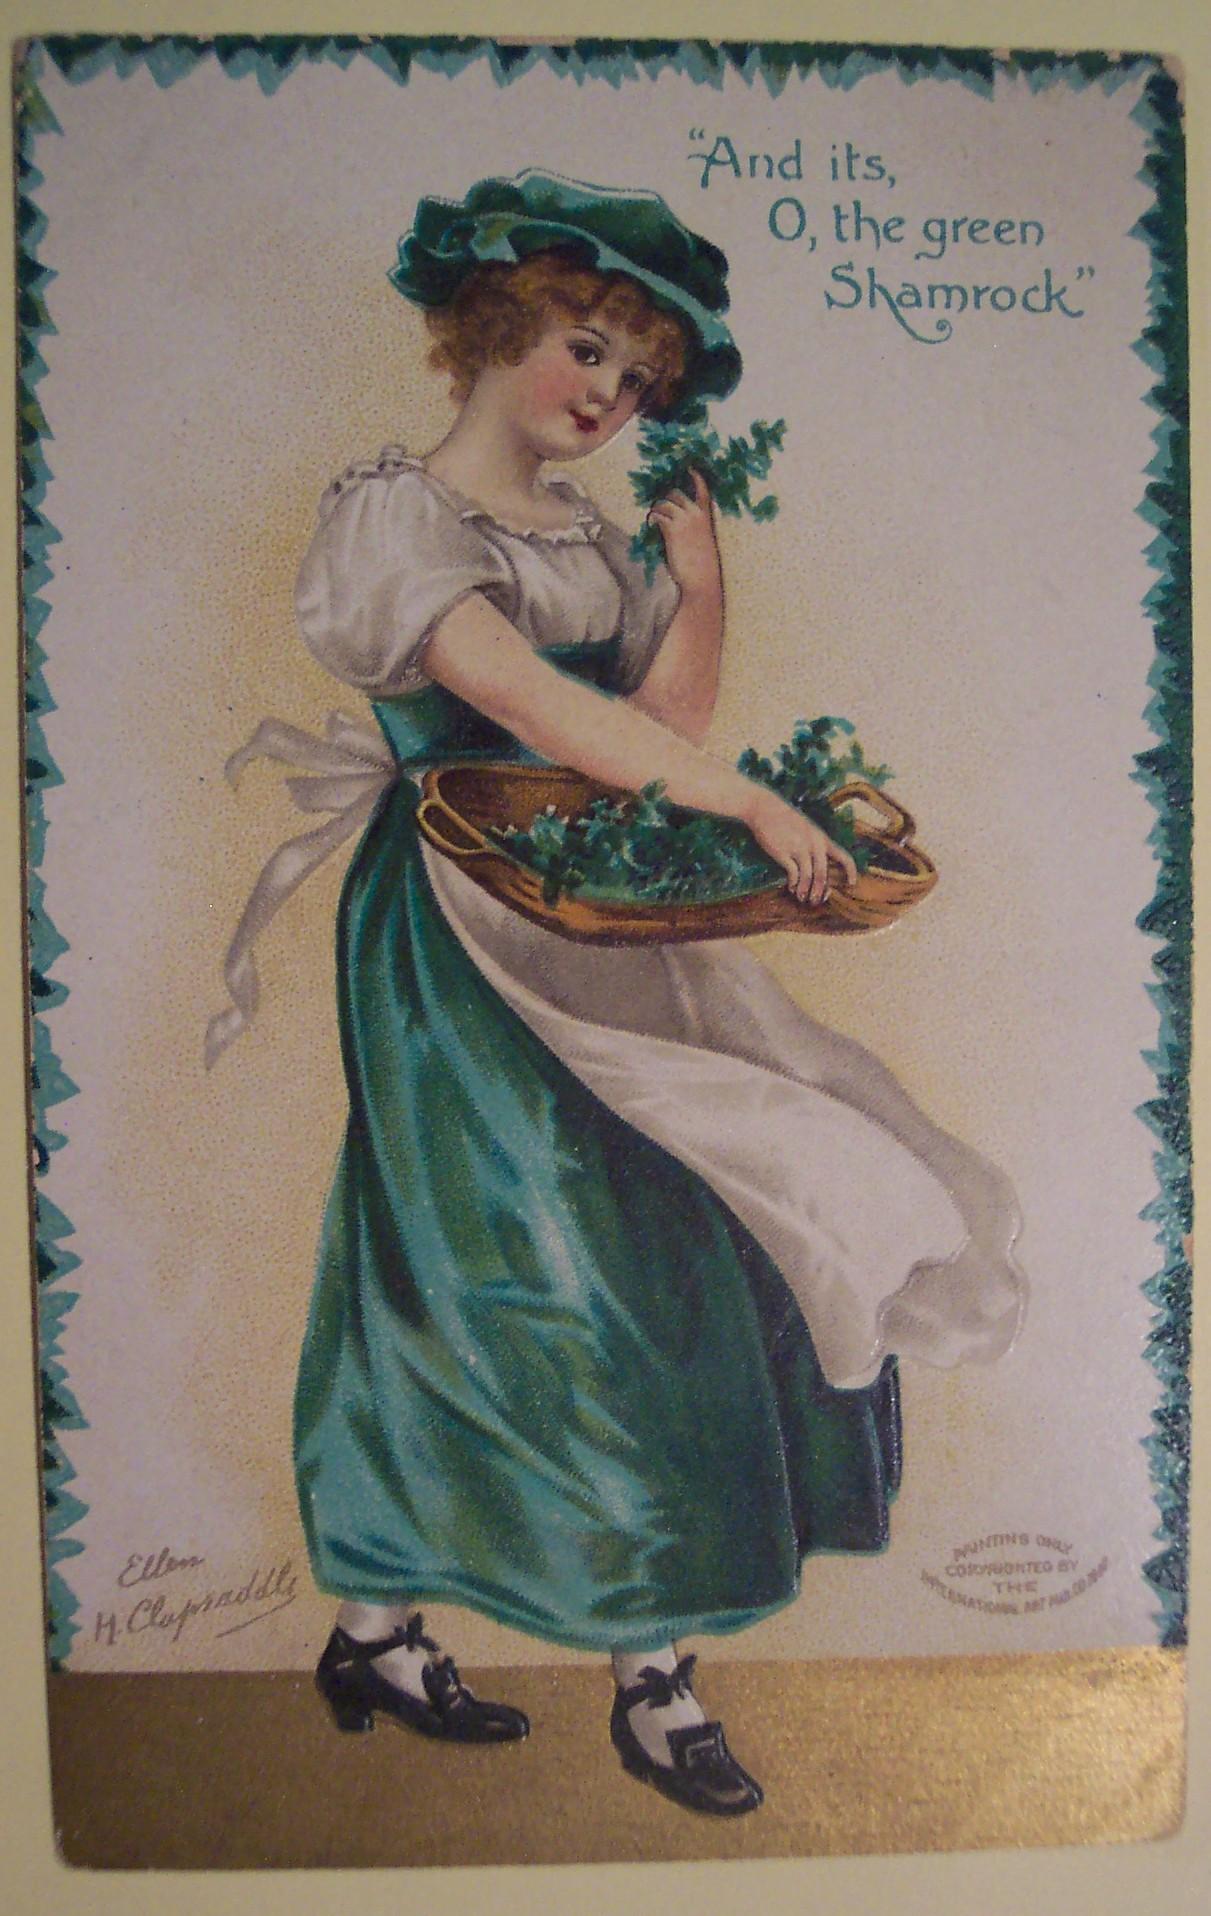 Happy St. Patrick's Day! Source: Flickr User riptheskull